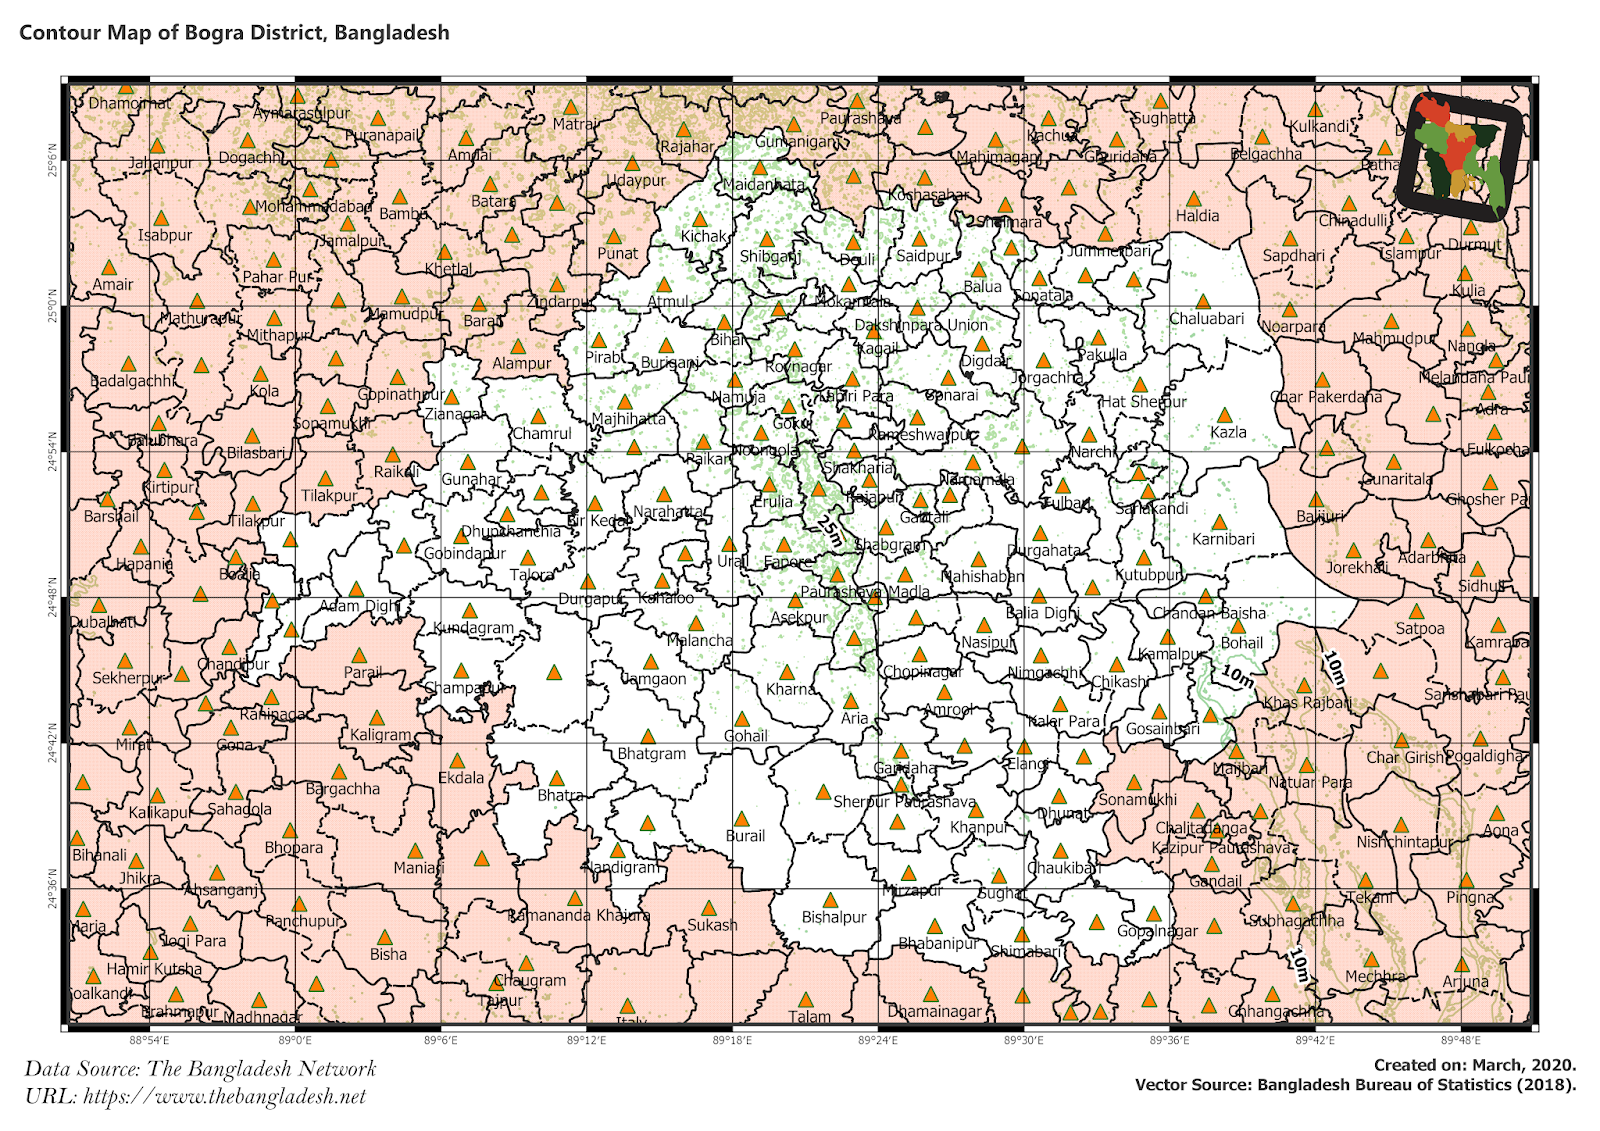 Elevation Map of Bogra District of Bangladesh